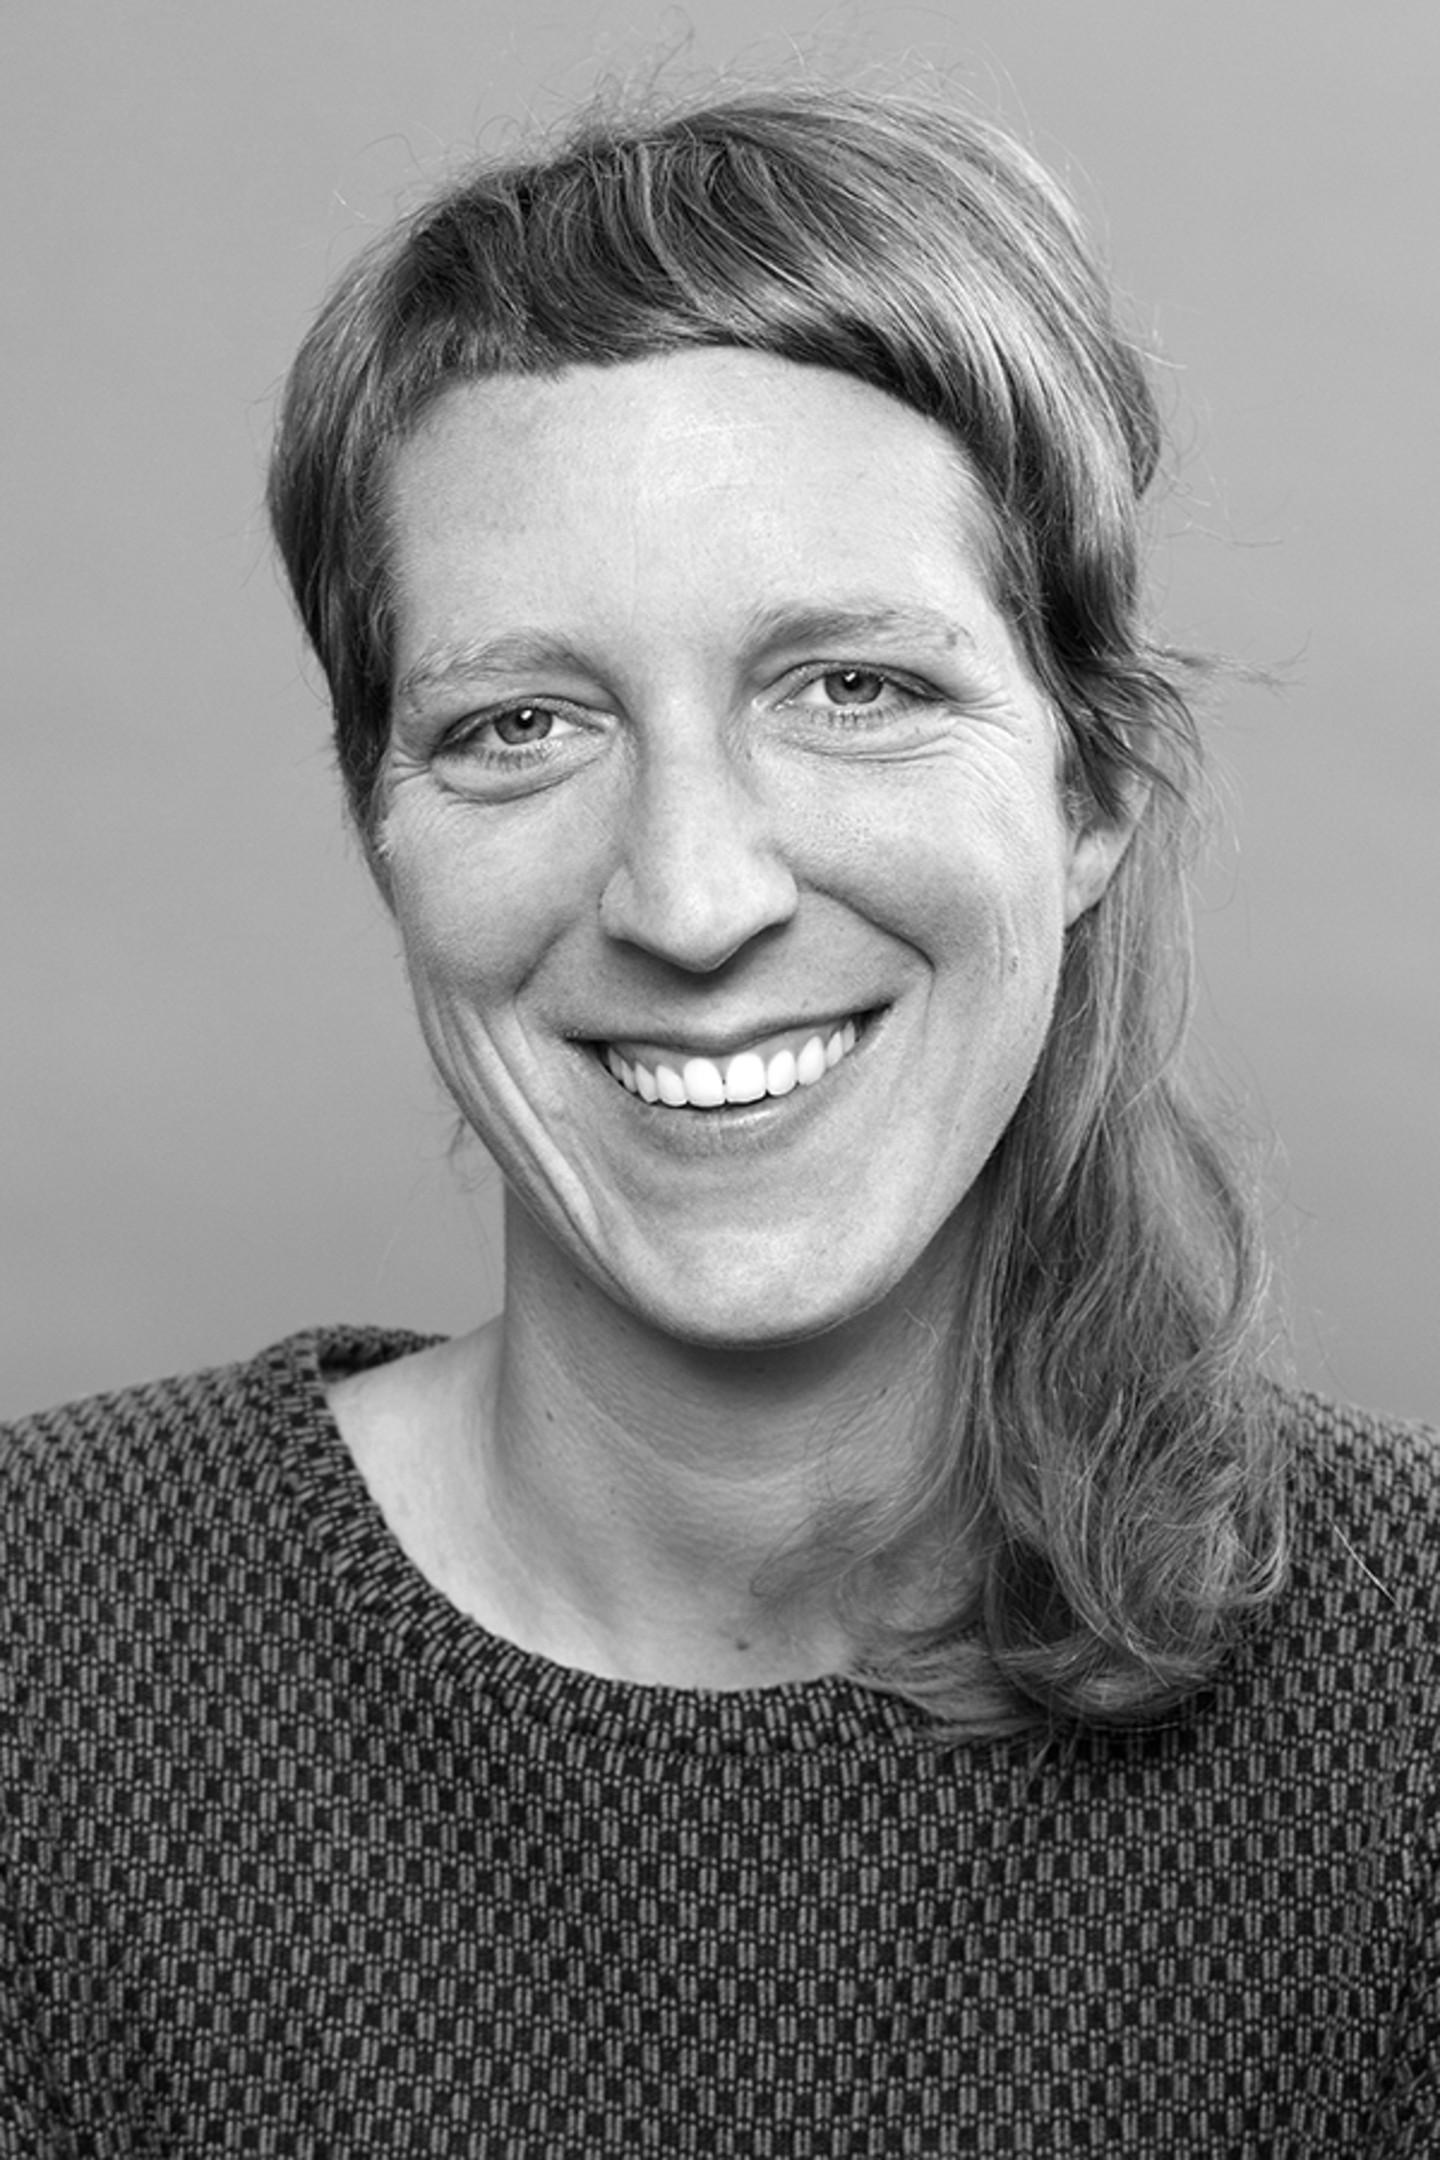 2019 Katharina Bo Llig nude photos 2019